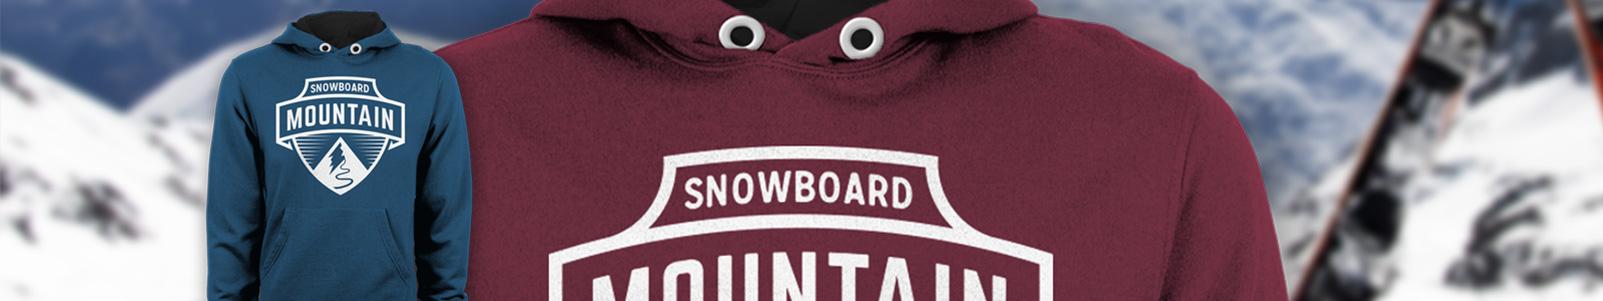 Ski trip hoodies